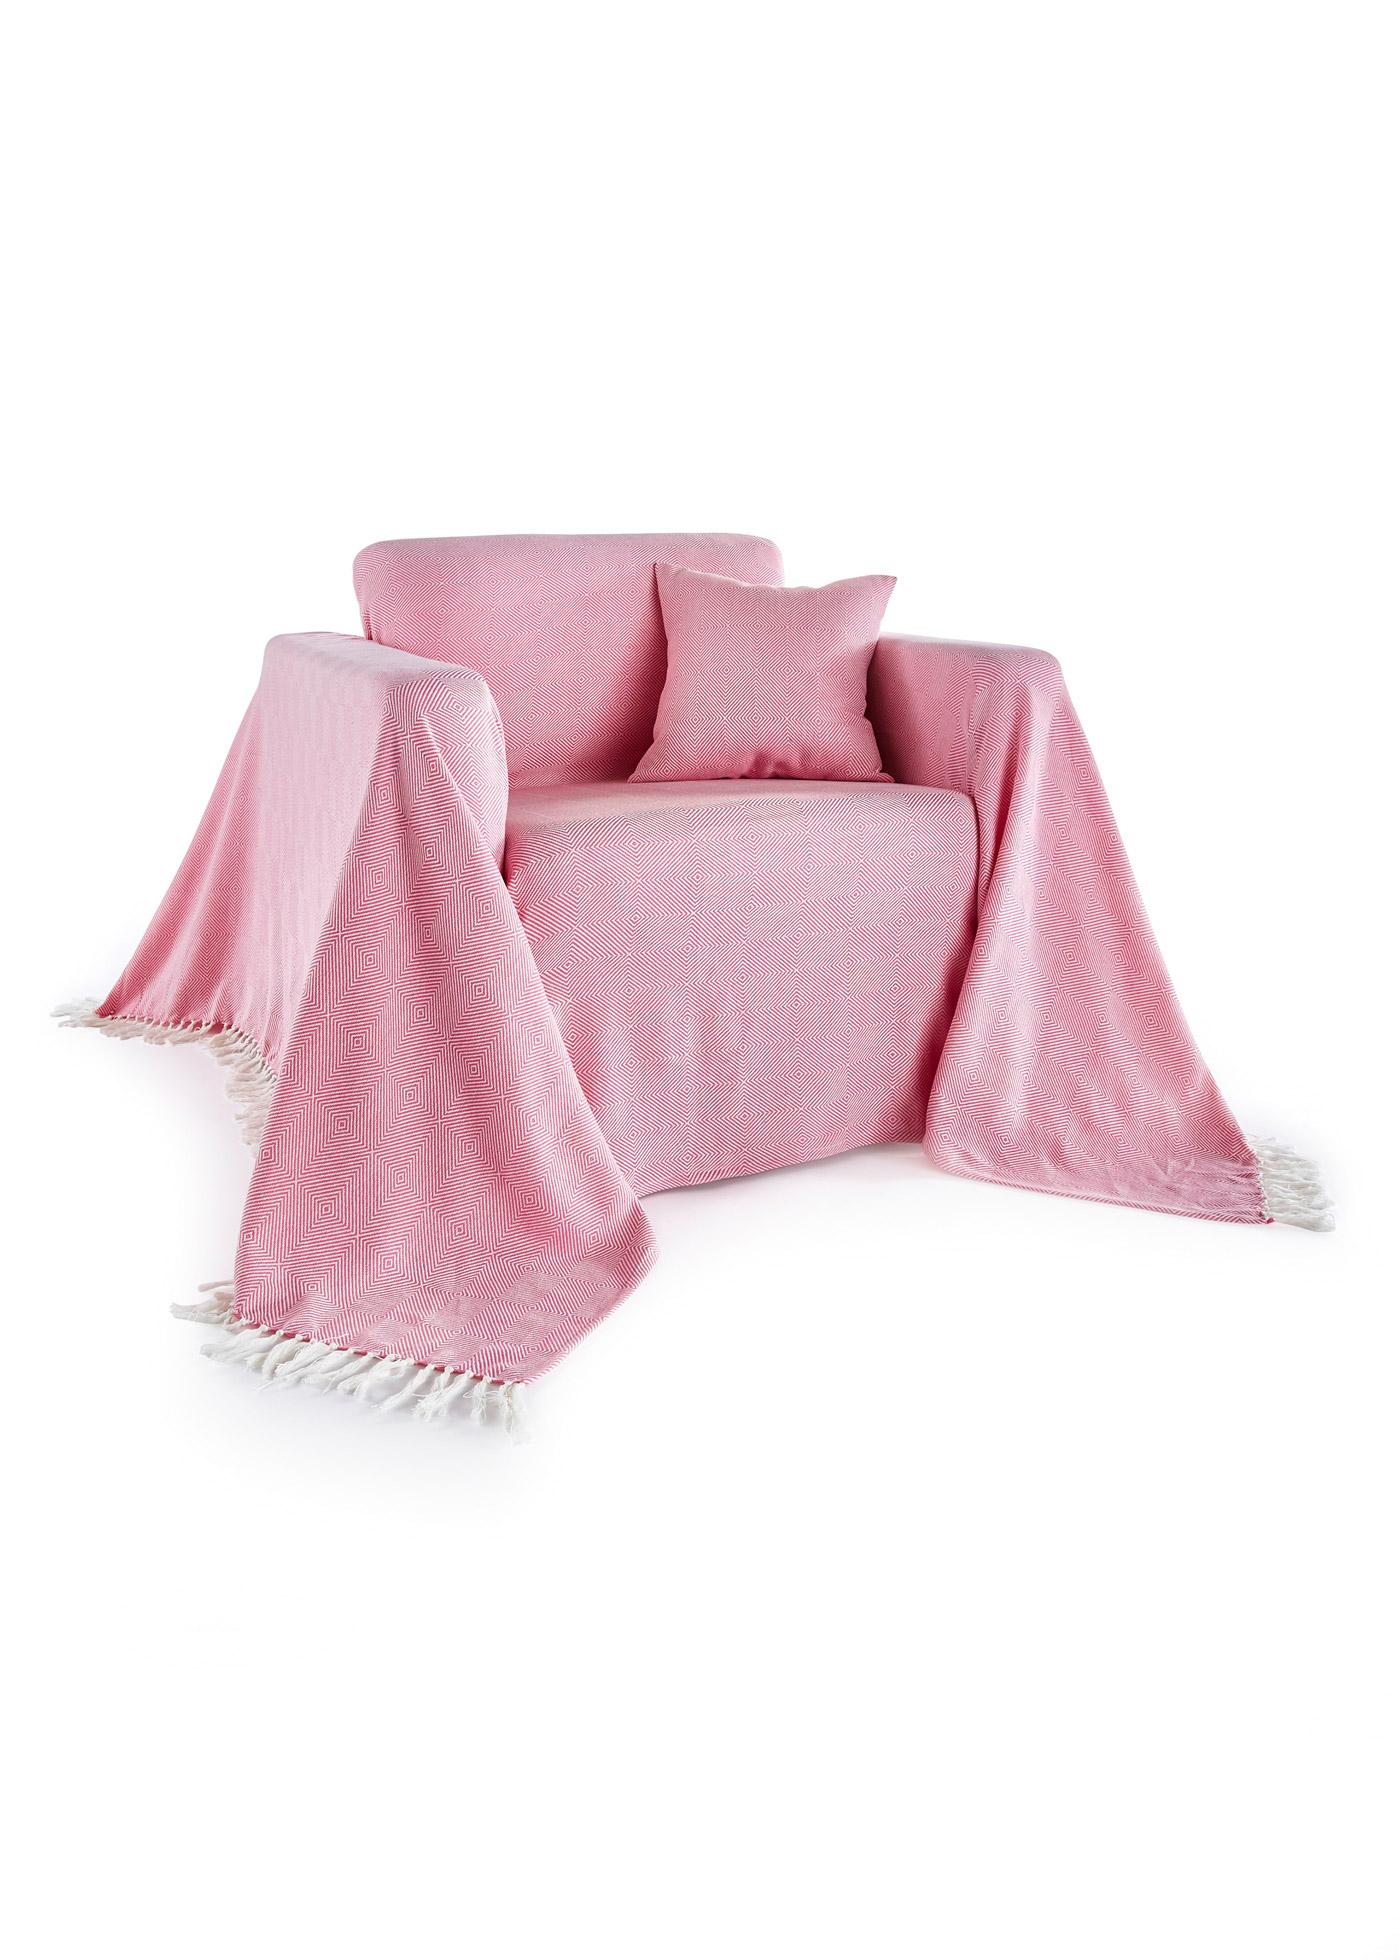 Telo copridivano con frange (rosa) - bpc living bonprix collection